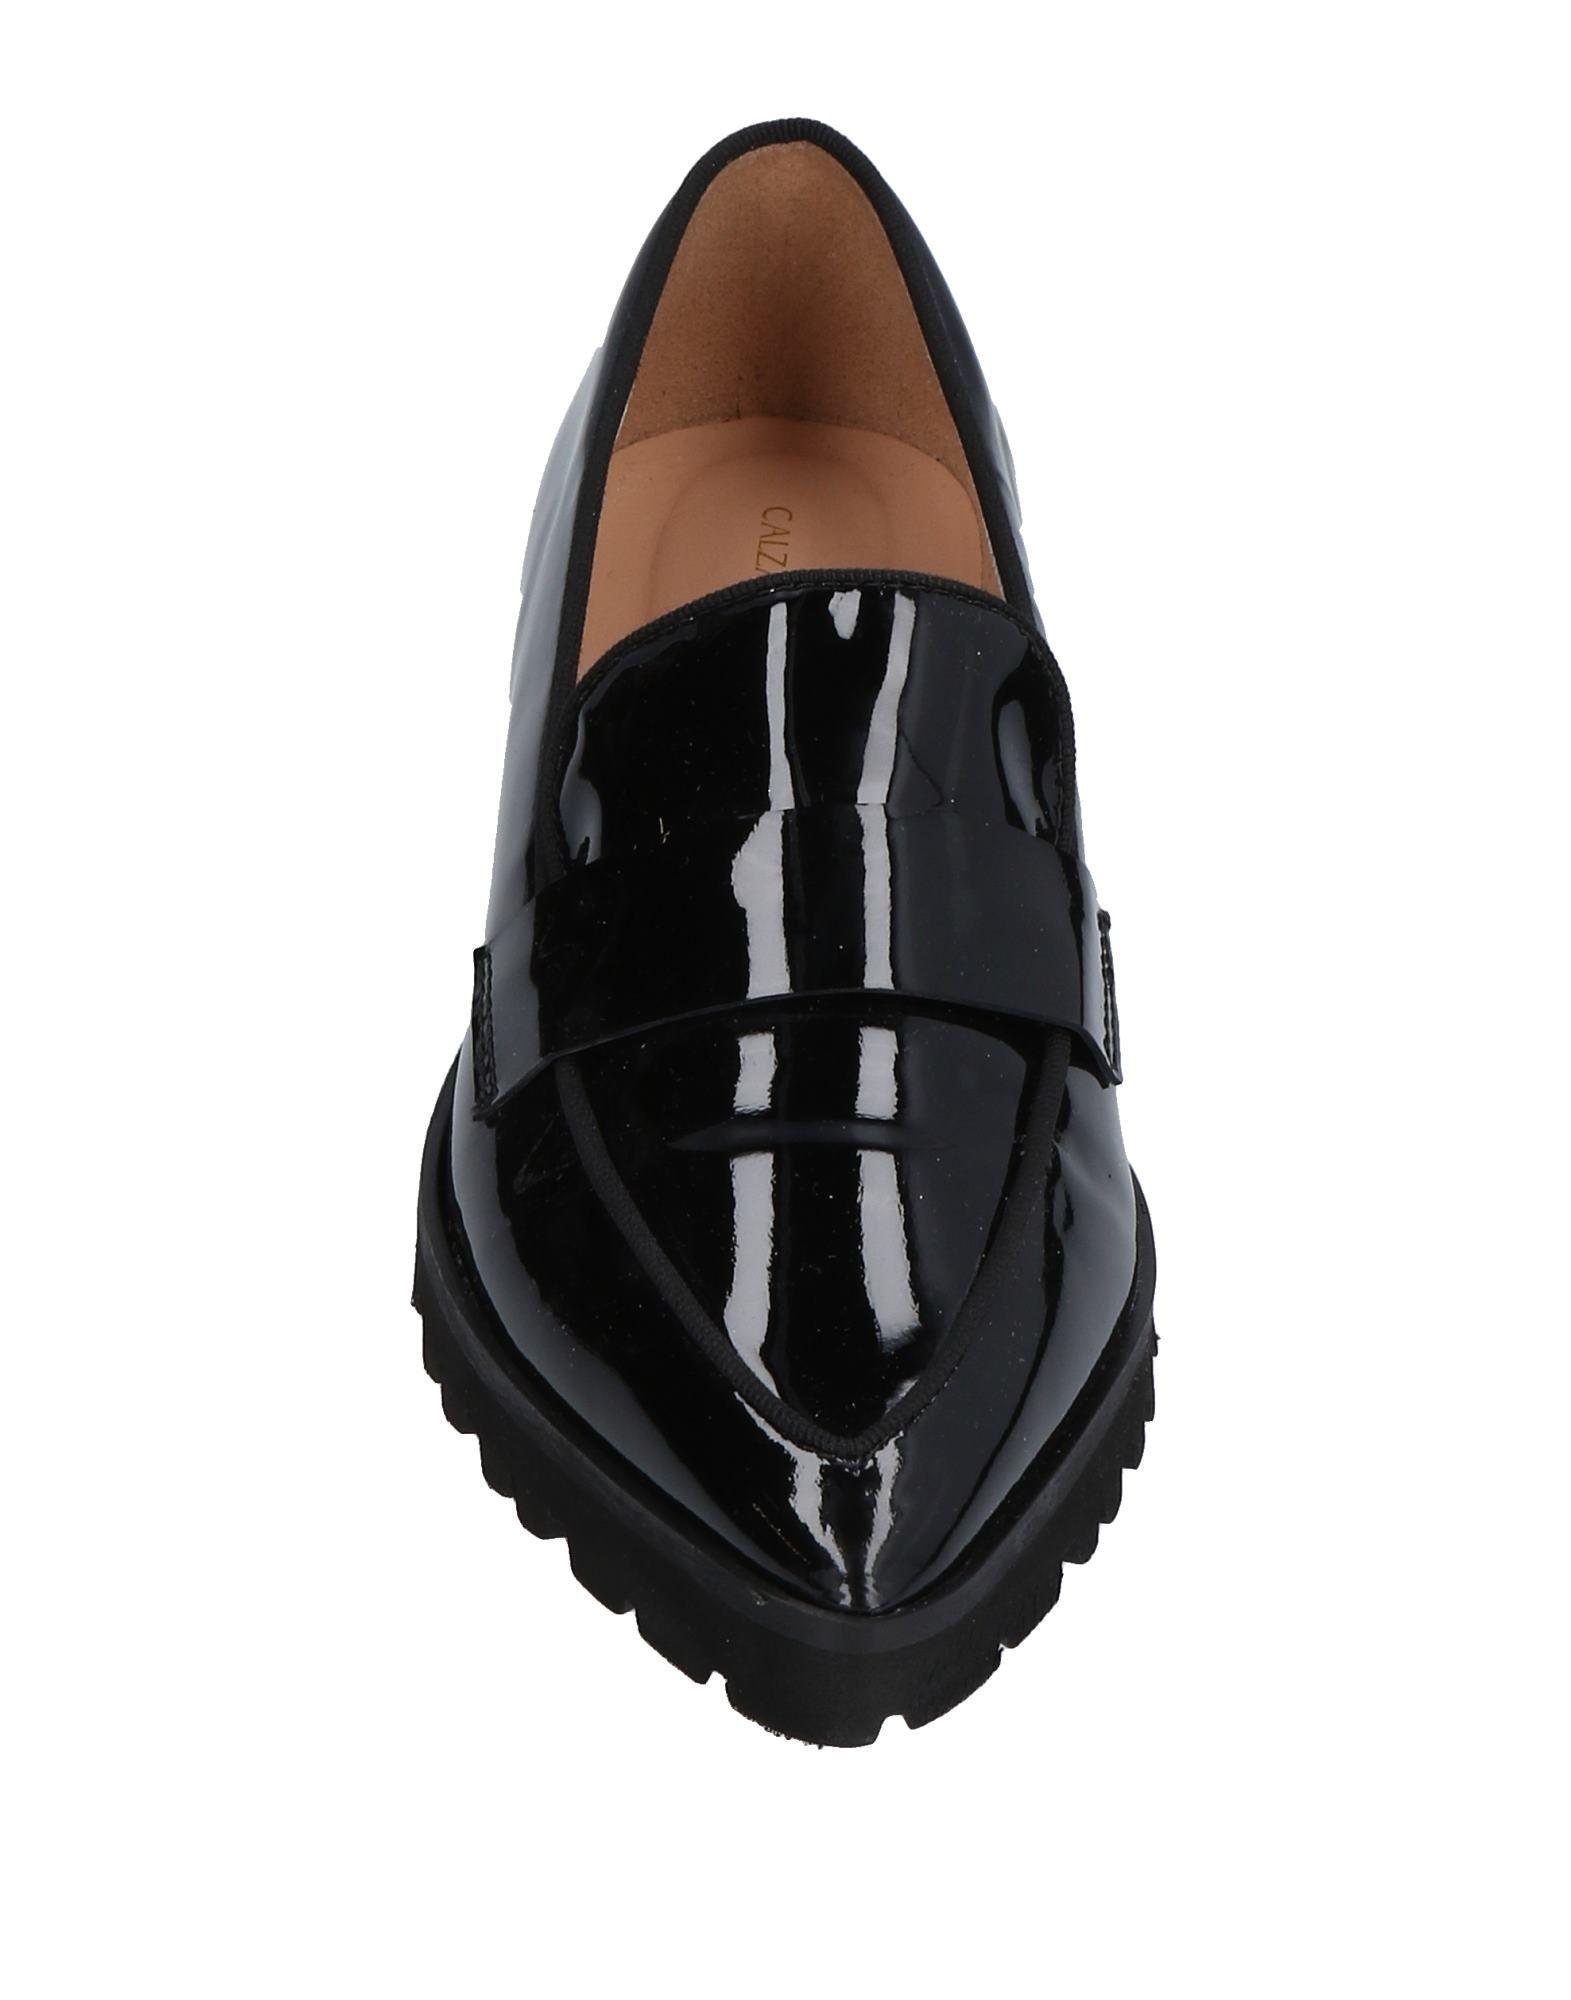 Calzaiuoli Toscani Loafers - - - Women Calzaiuoli Toscani Loafers online on  United Kingdom - 11509955XI 5c19a7